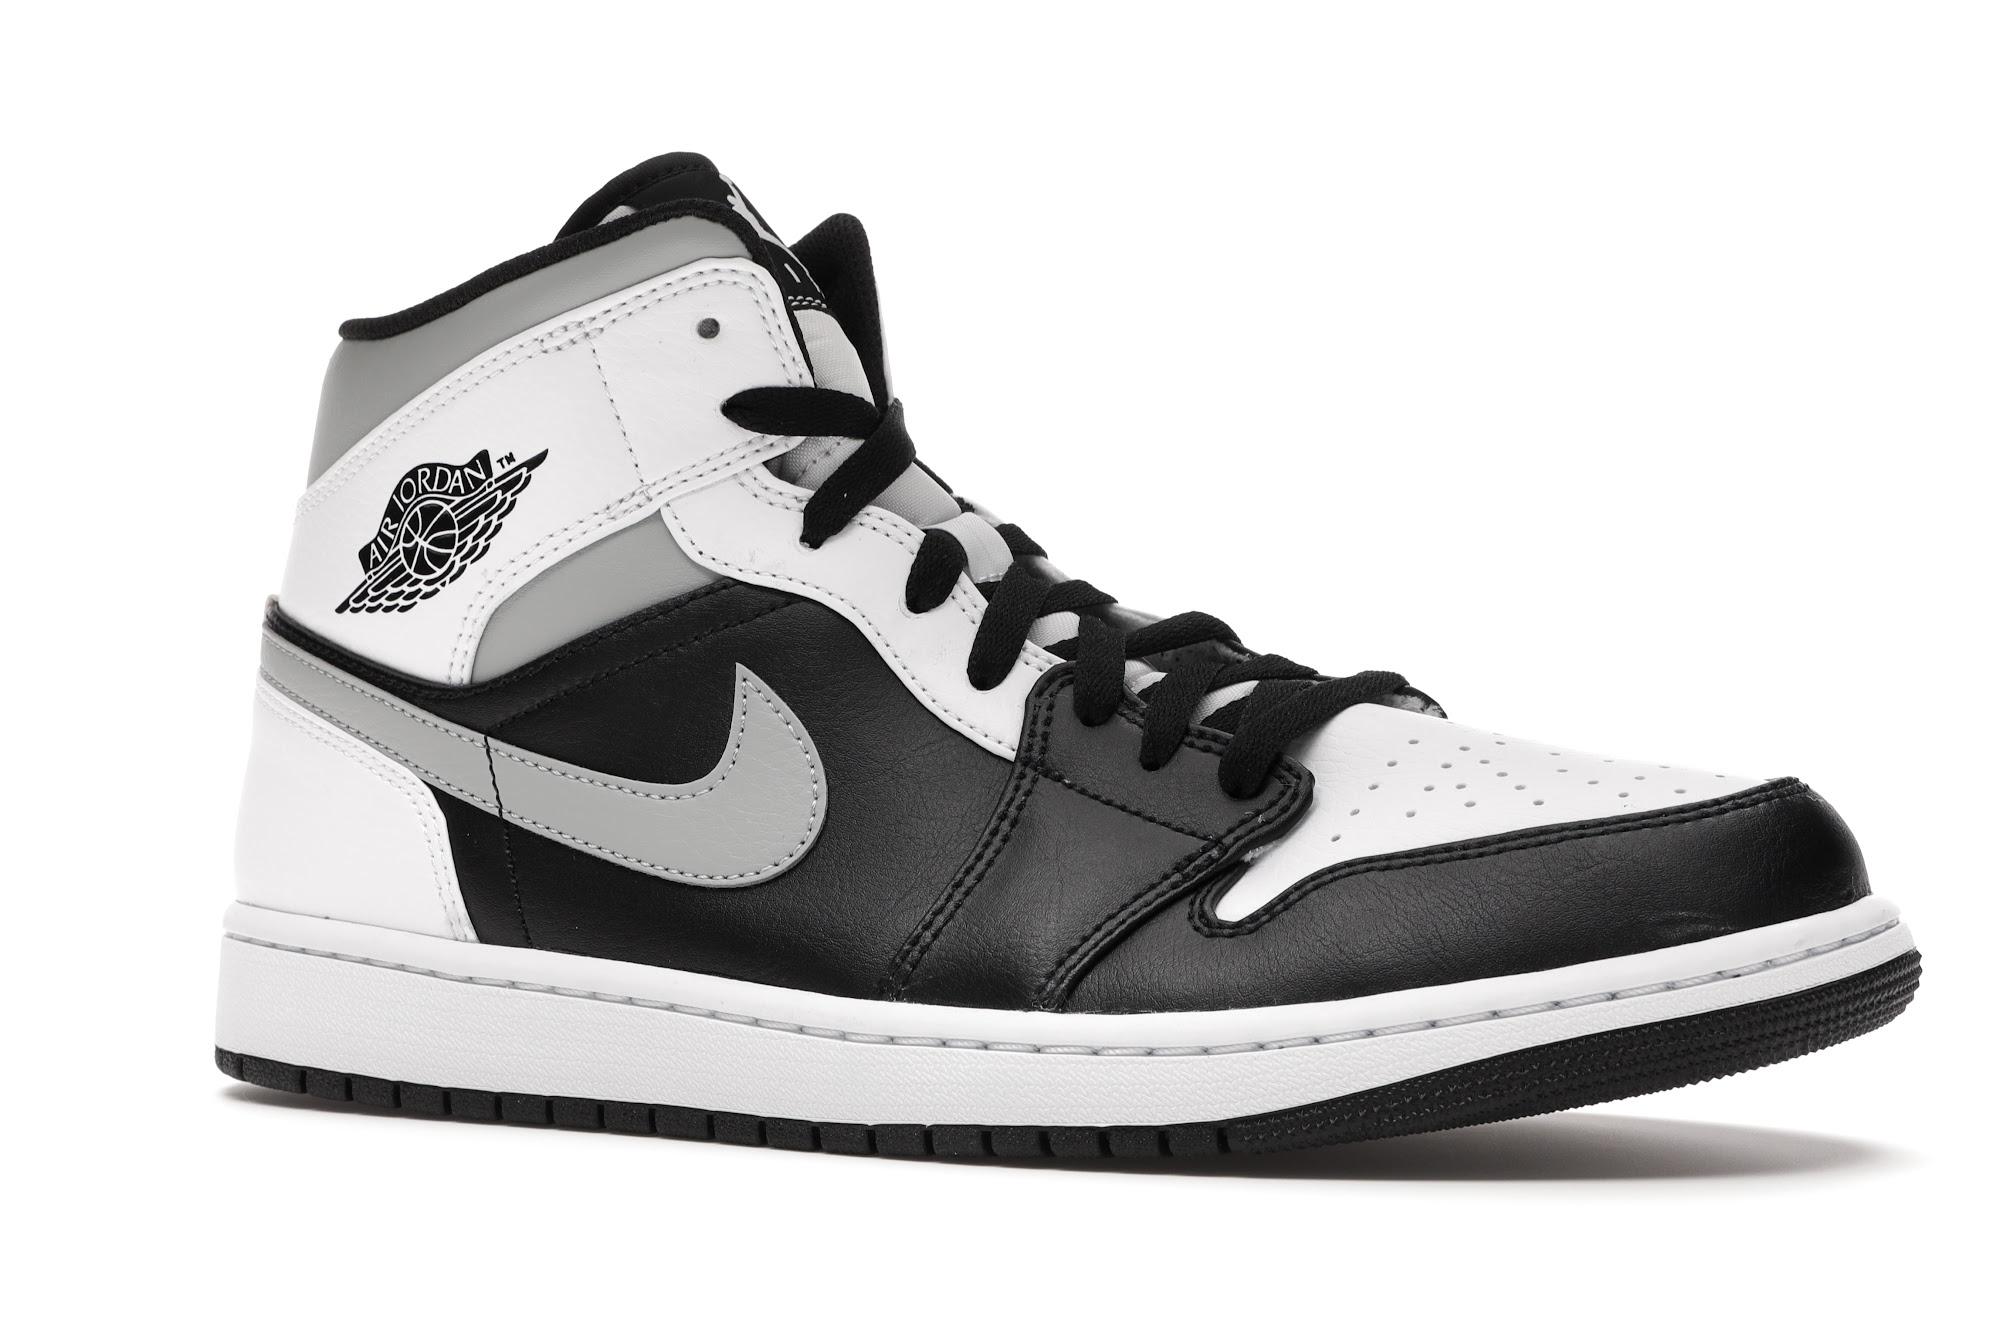 Jordan 1 Mid White Shadow - 554724-073